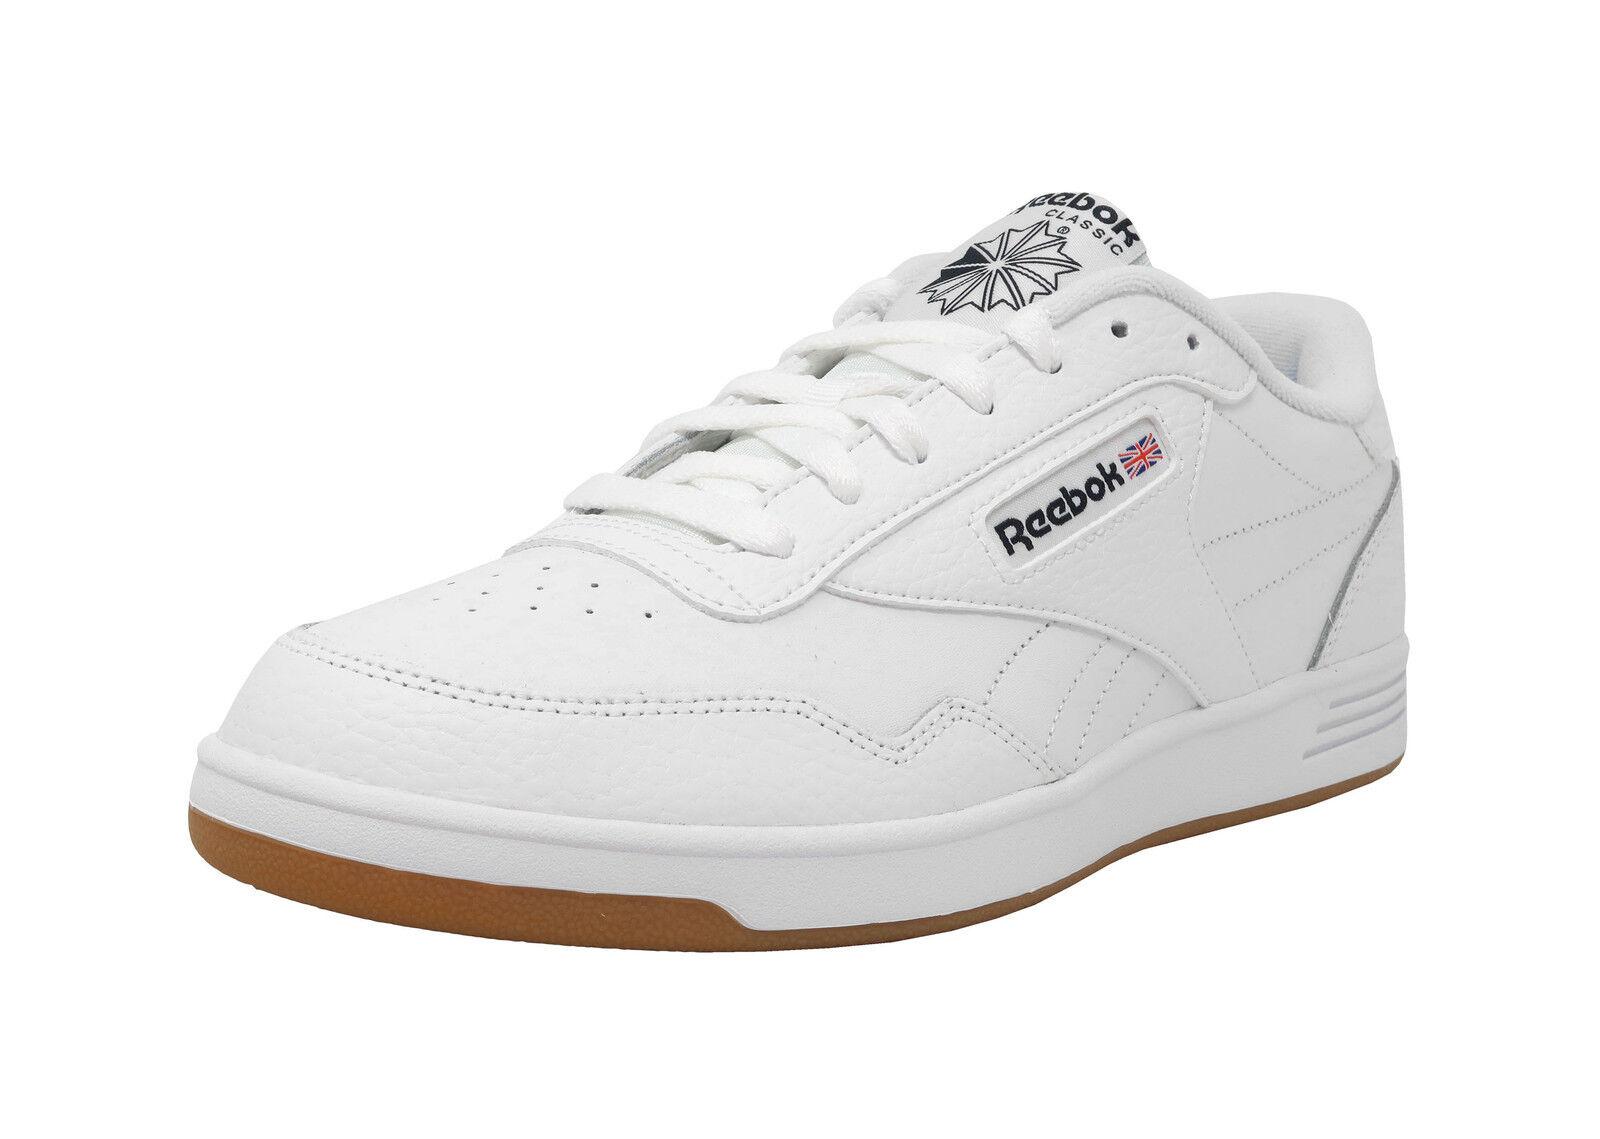 REEBOK Club Memt Memory Tech Blanc Gomme Lacets Baskets Mode Hommes Chaussures